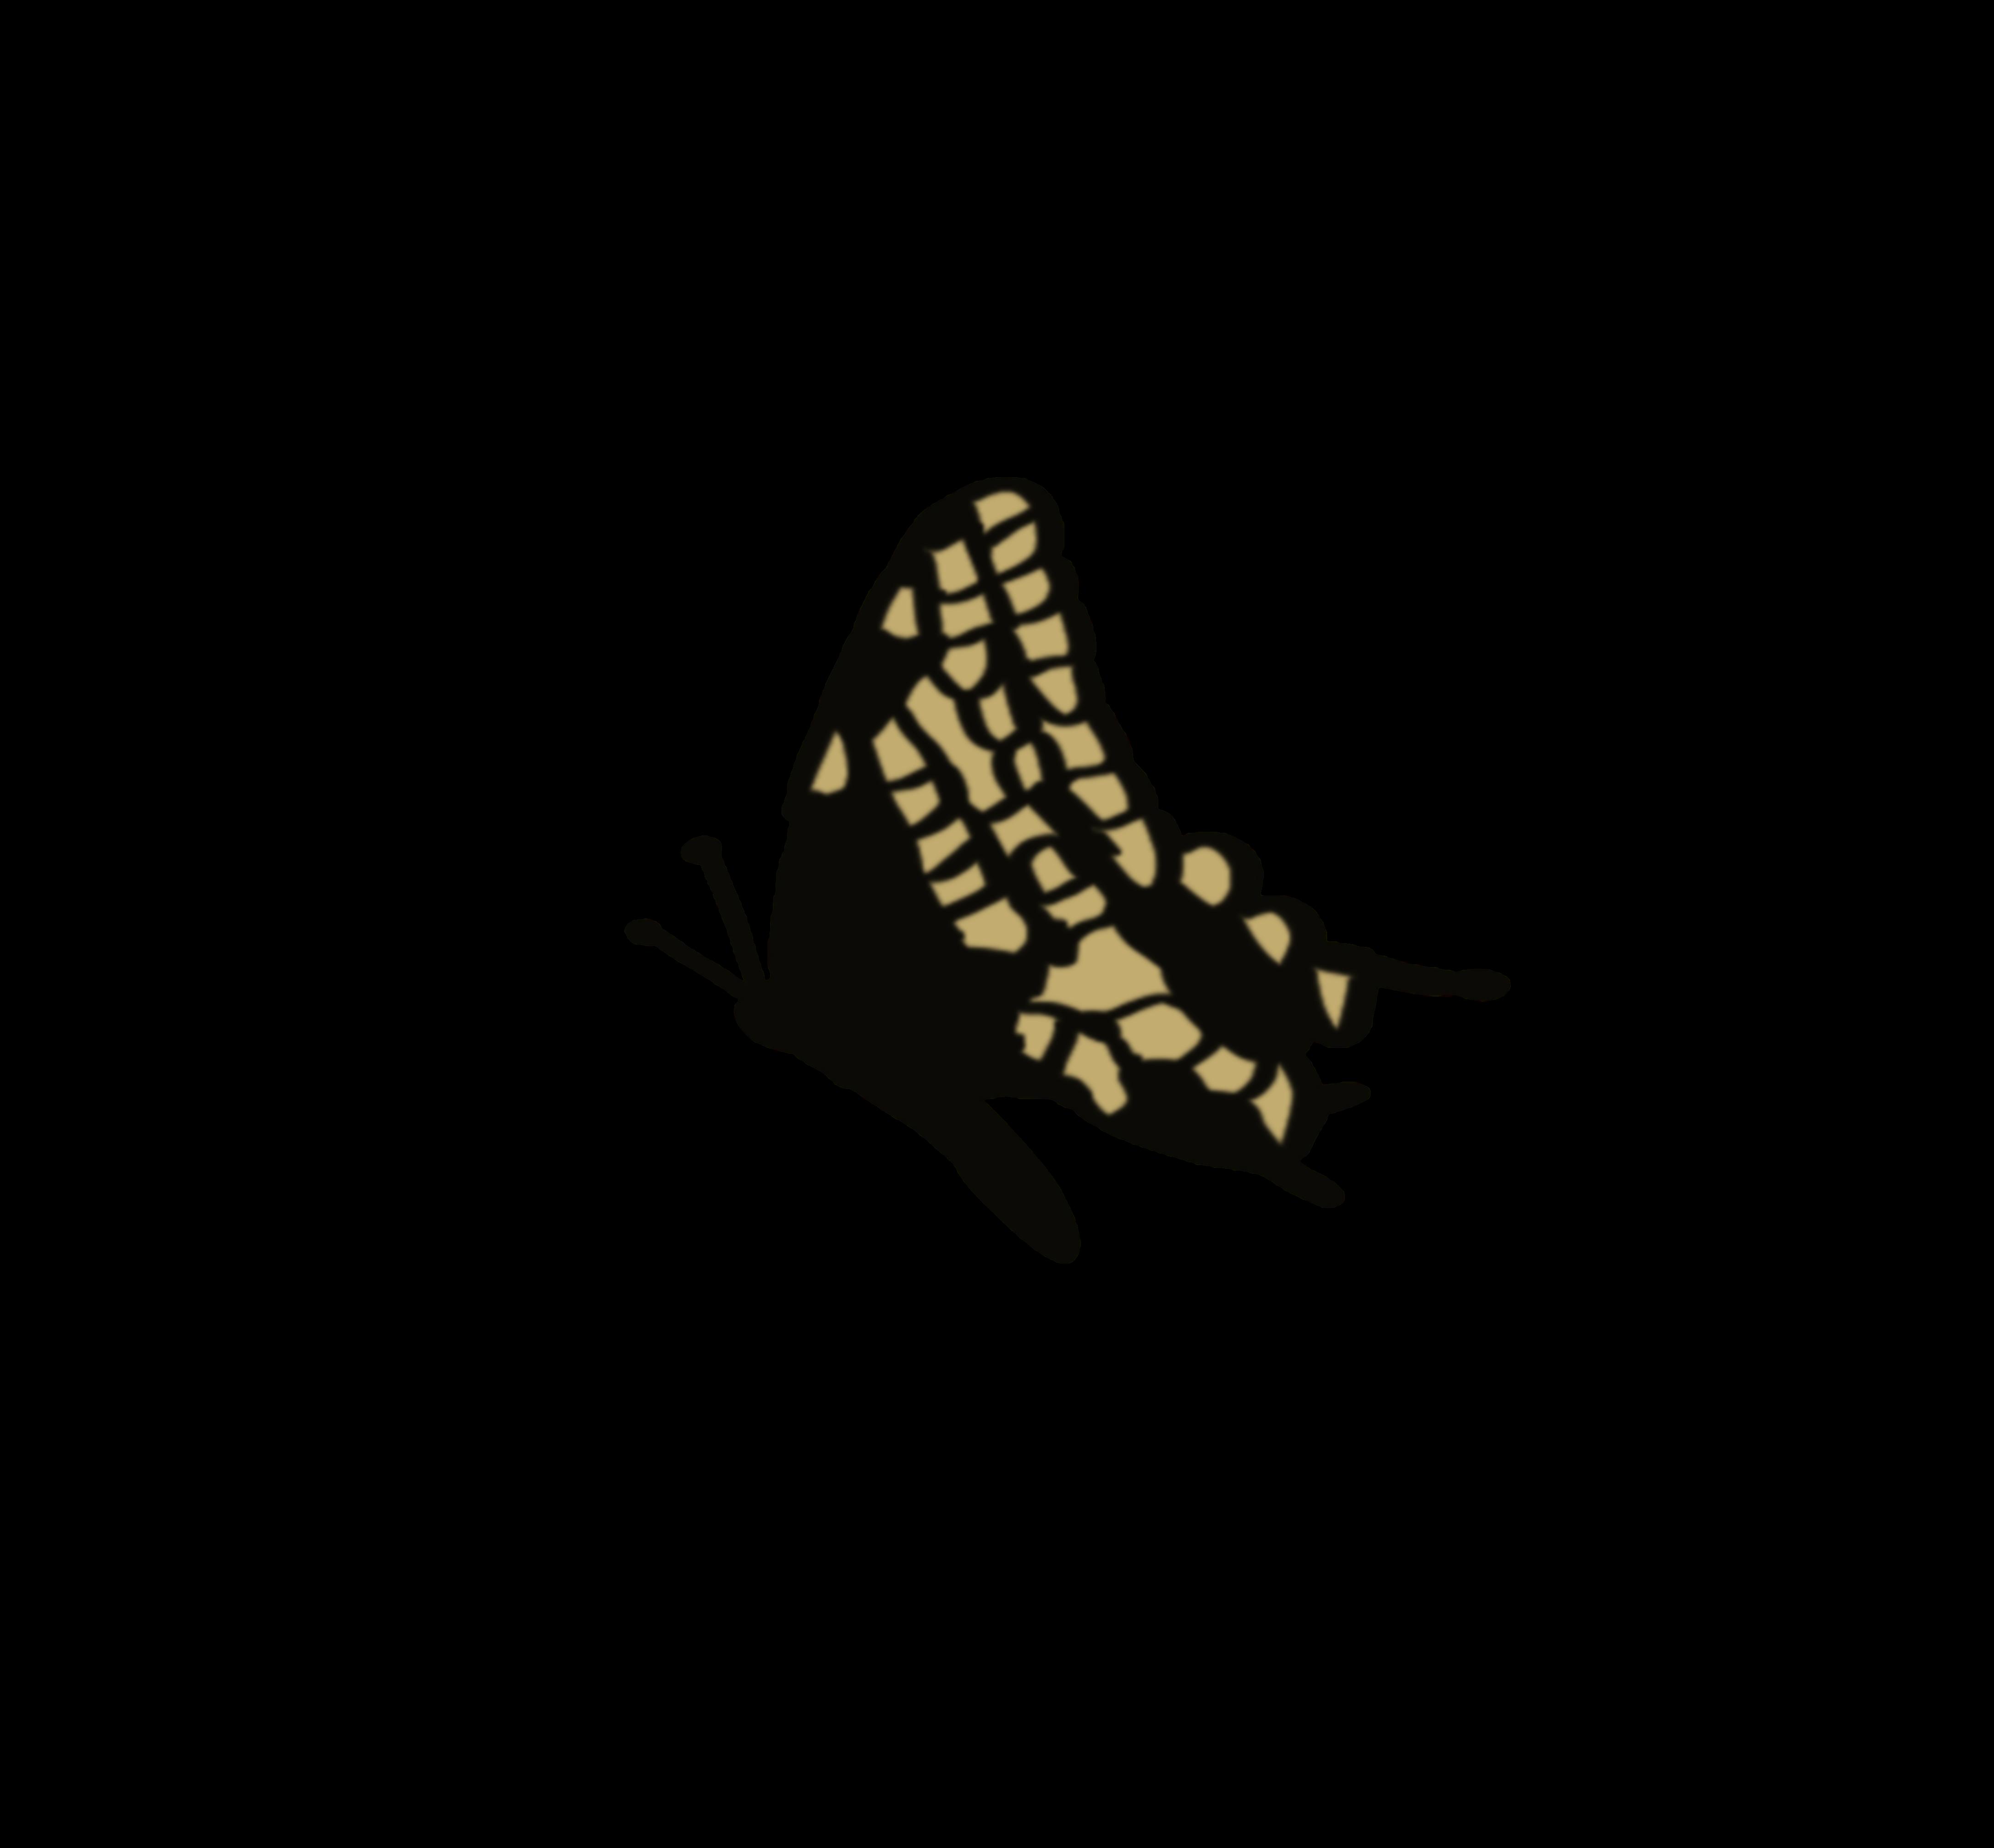 Yellow Black Butterfly Black Butterfly Yellow Butterfly Yellow Black